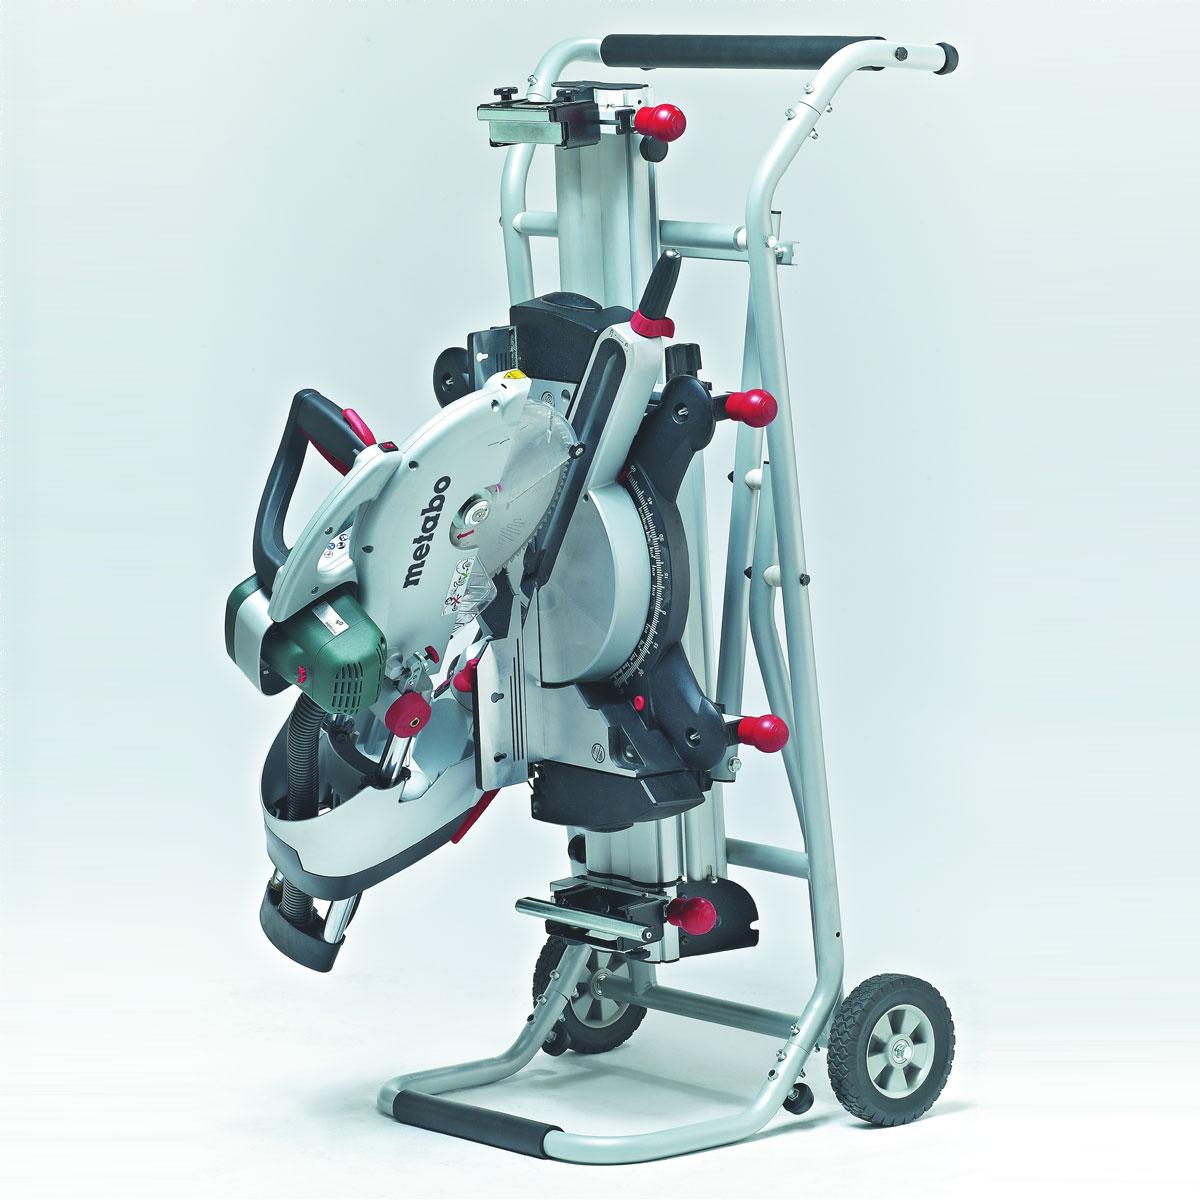 metabo scie onglets radiale kgs 315 plus. Black Bedroom Furniture Sets. Home Design Ideas